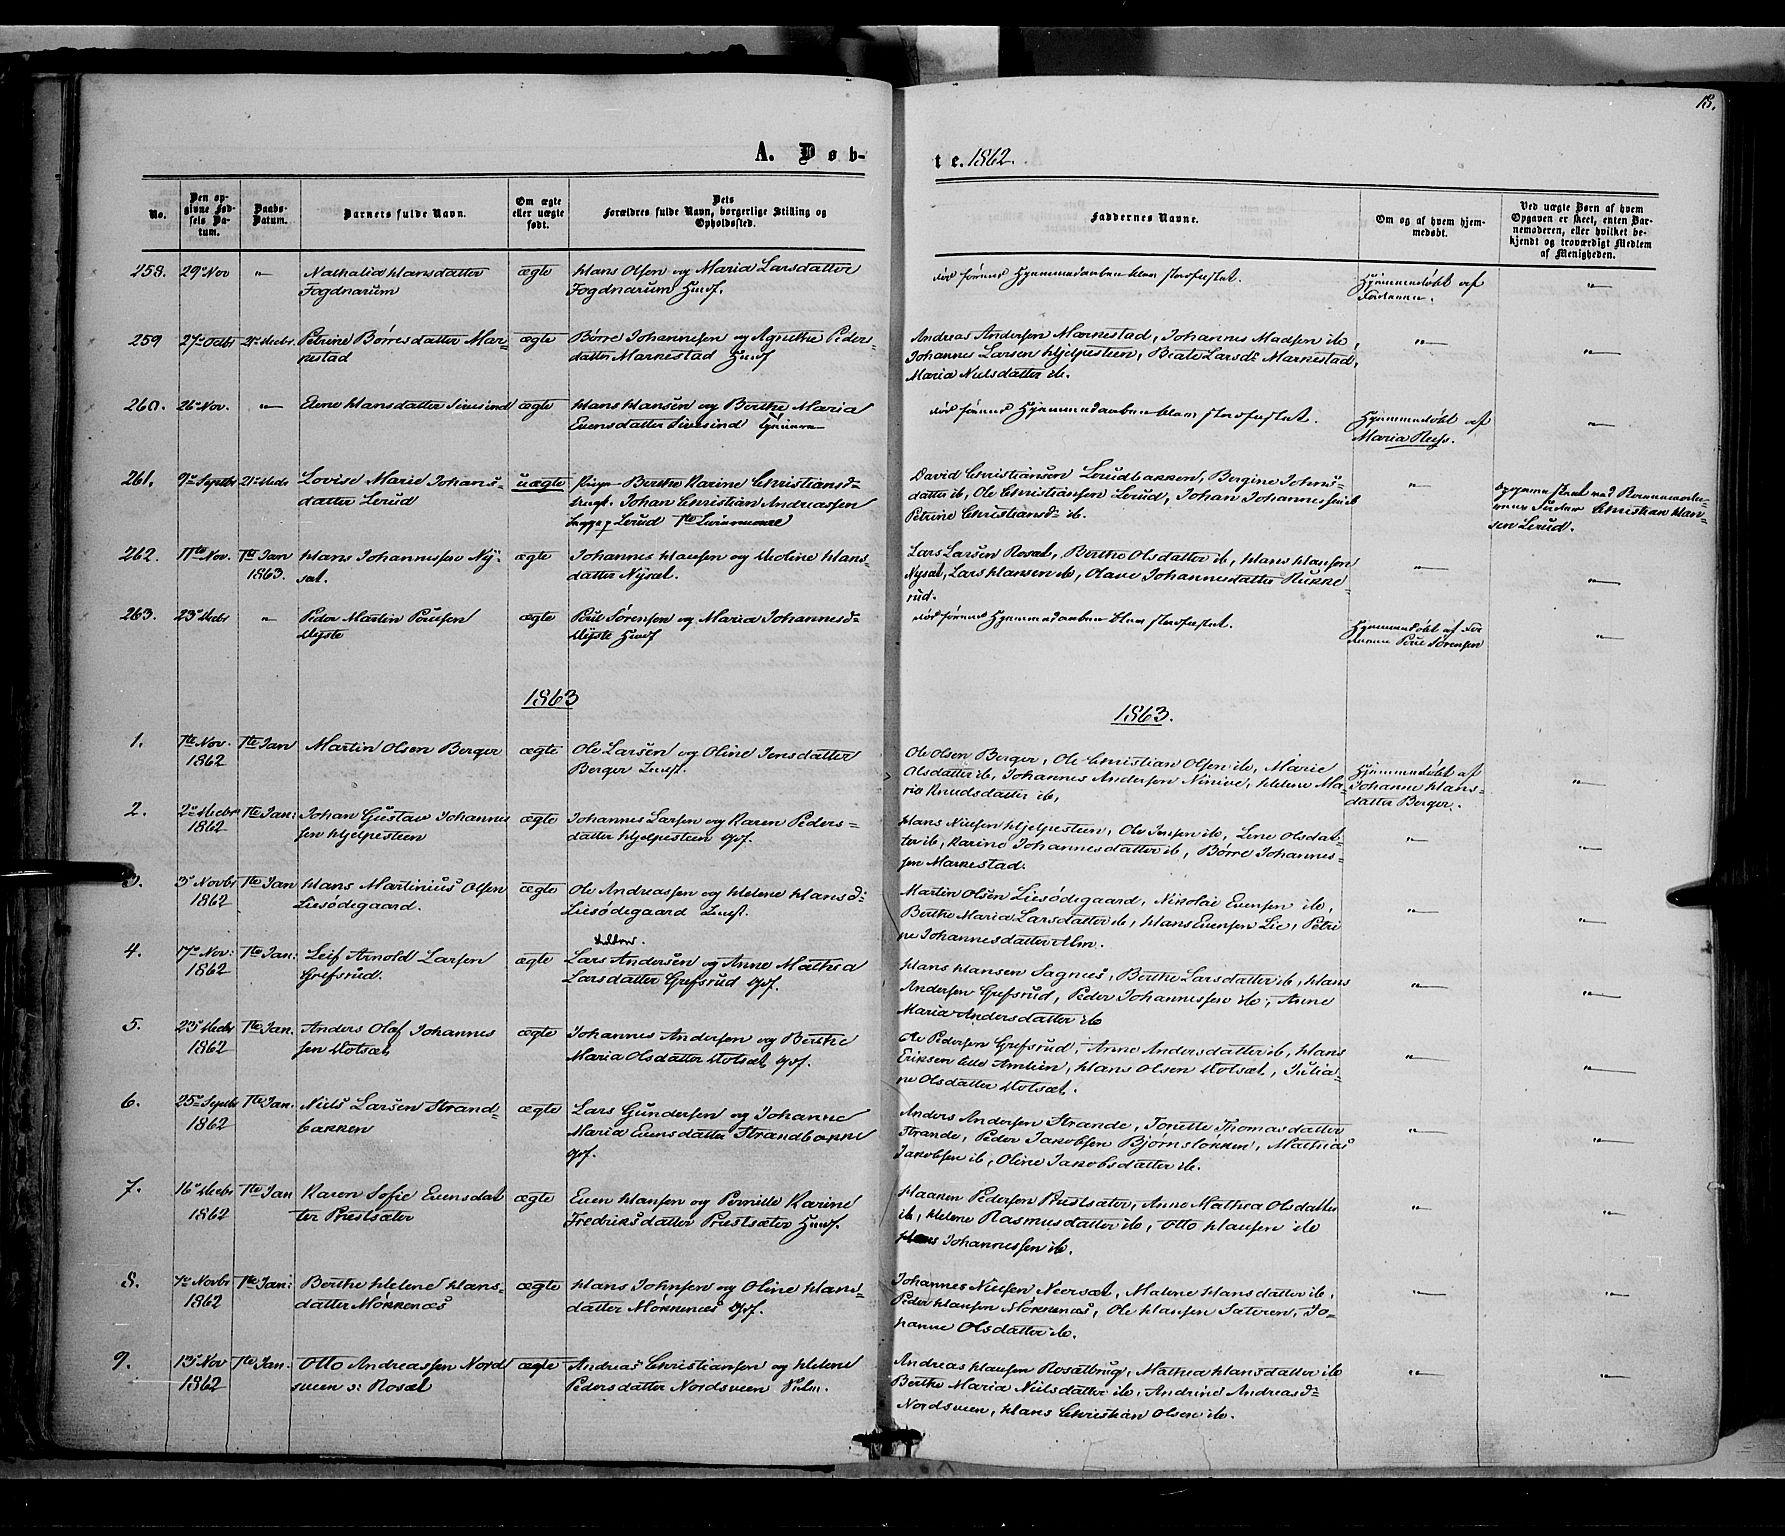 SAH, Vestre Toten prestekontor, H/Ha/Haa/L0007: Ministerialbok nr. 7, 1862-1869, s. 18